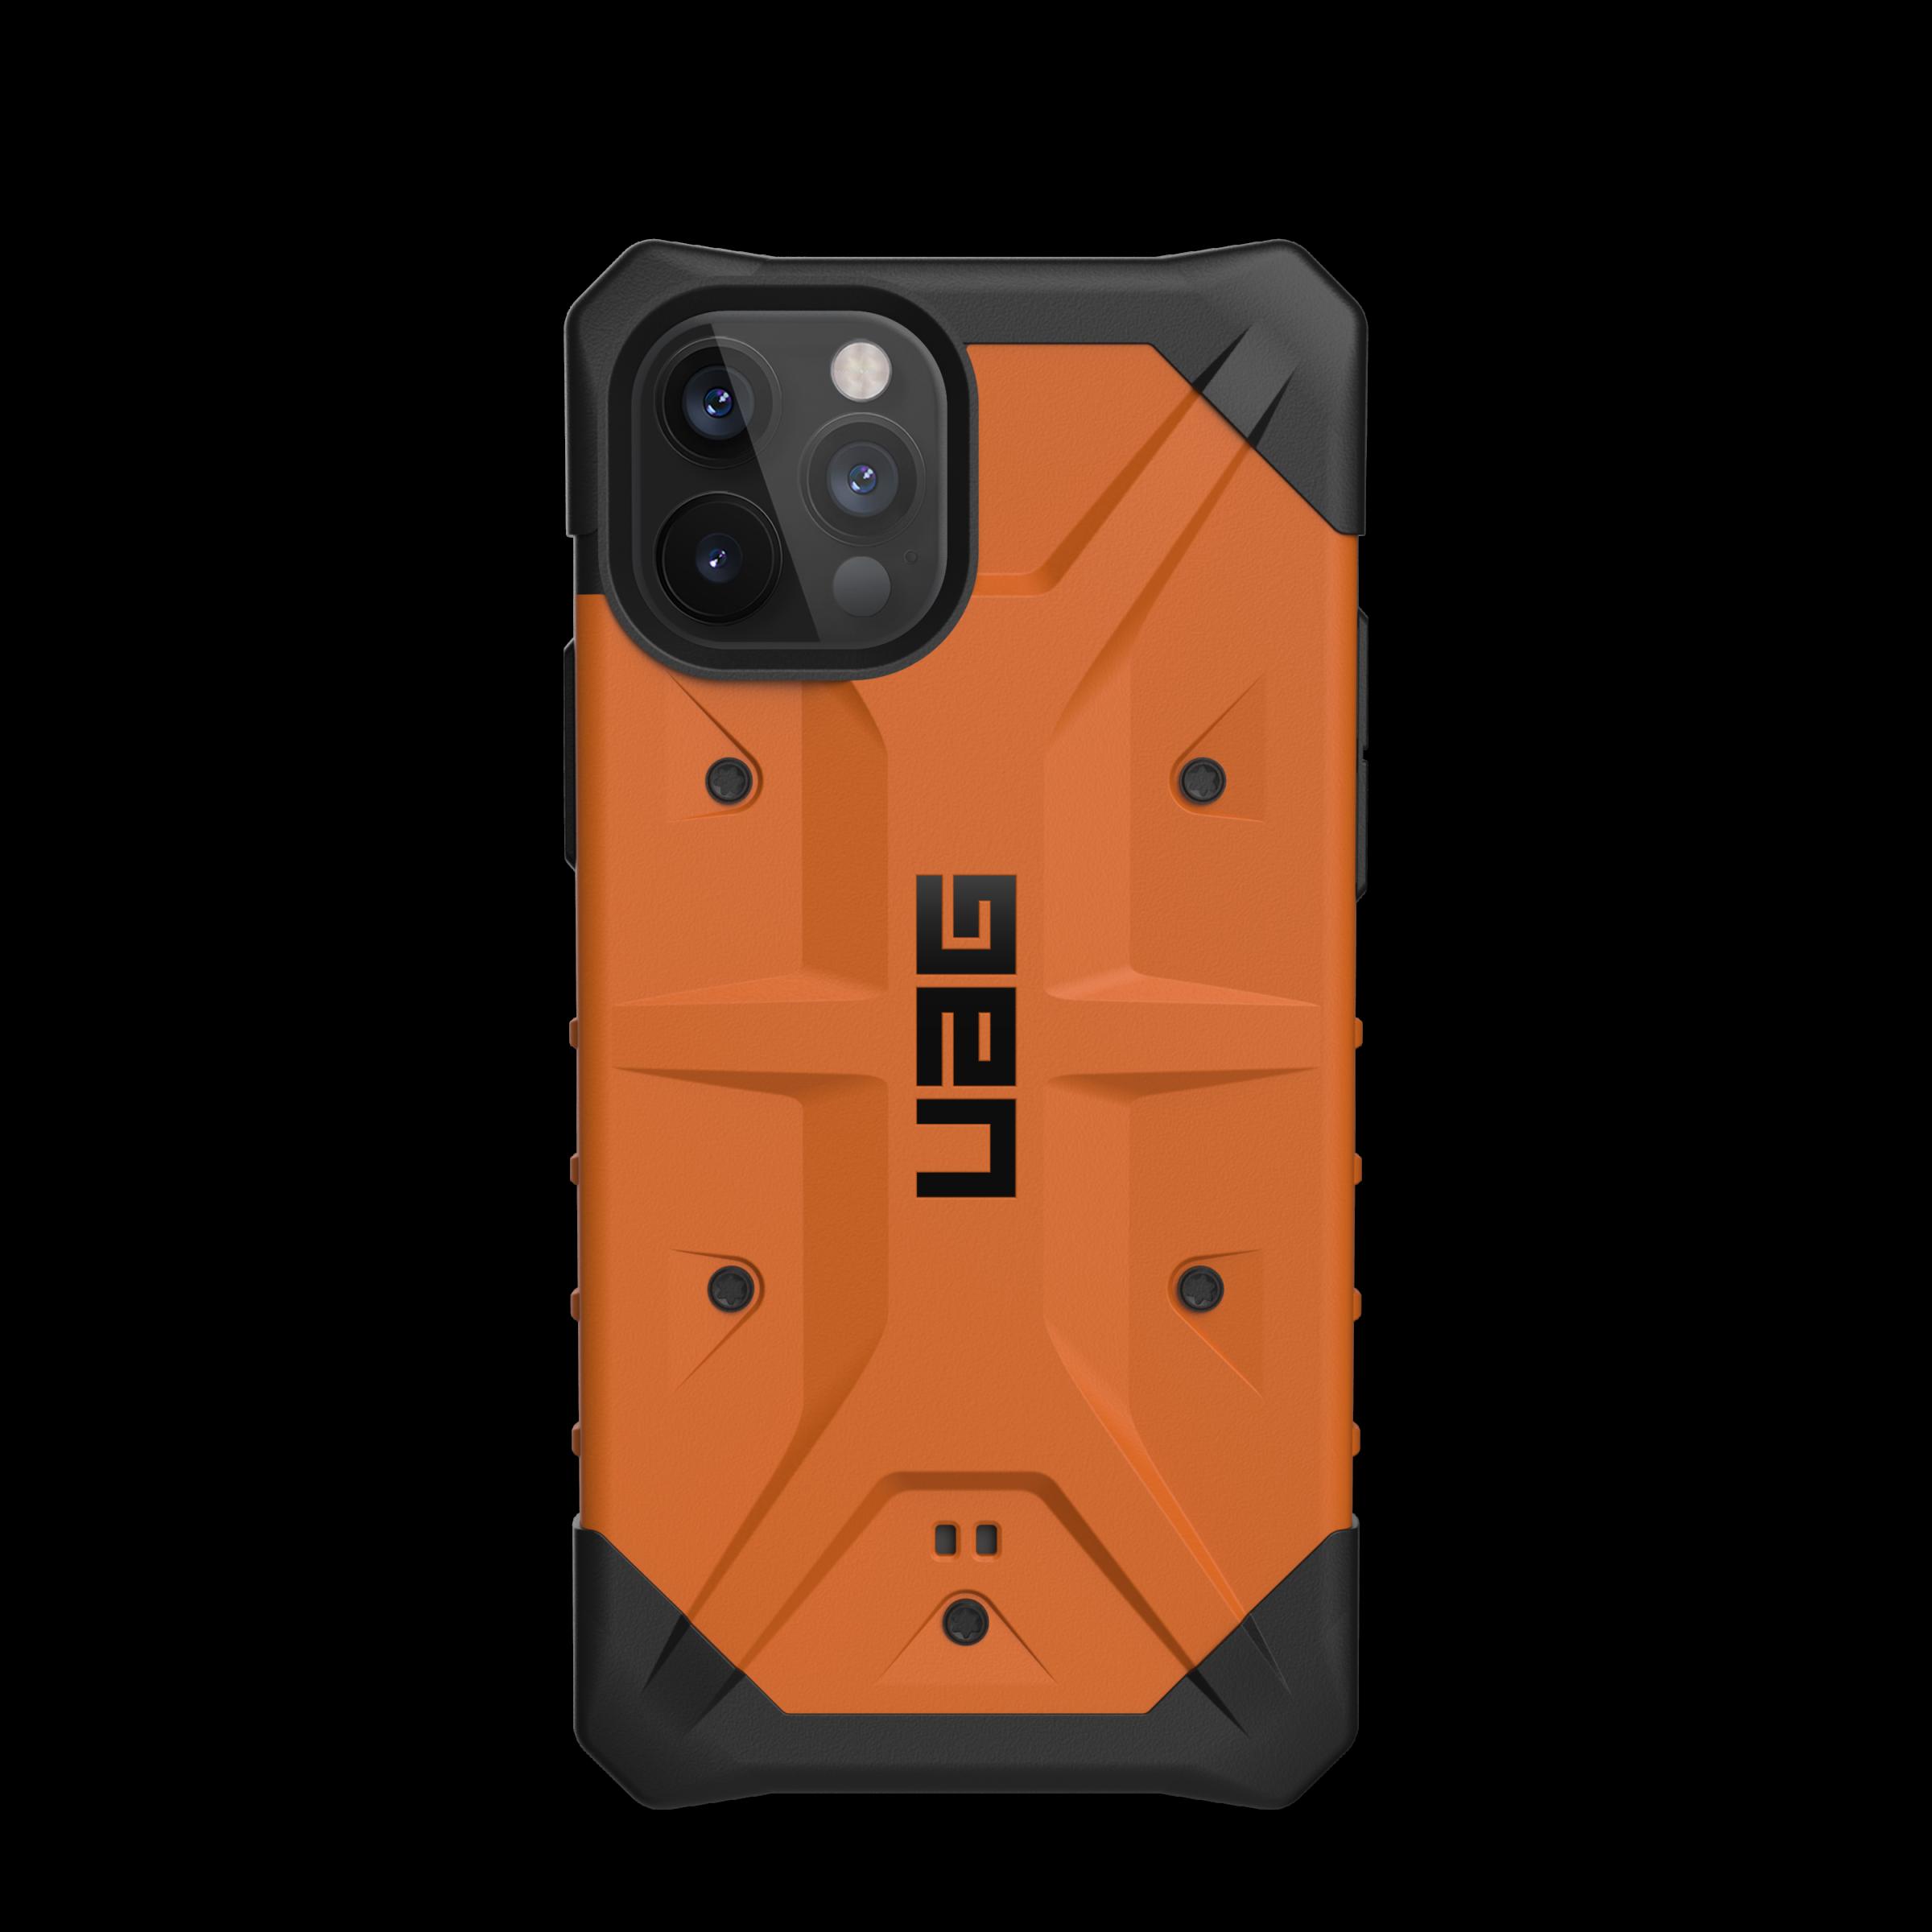 Pathfinder Series Case iPhone 12/12 Pro Orange